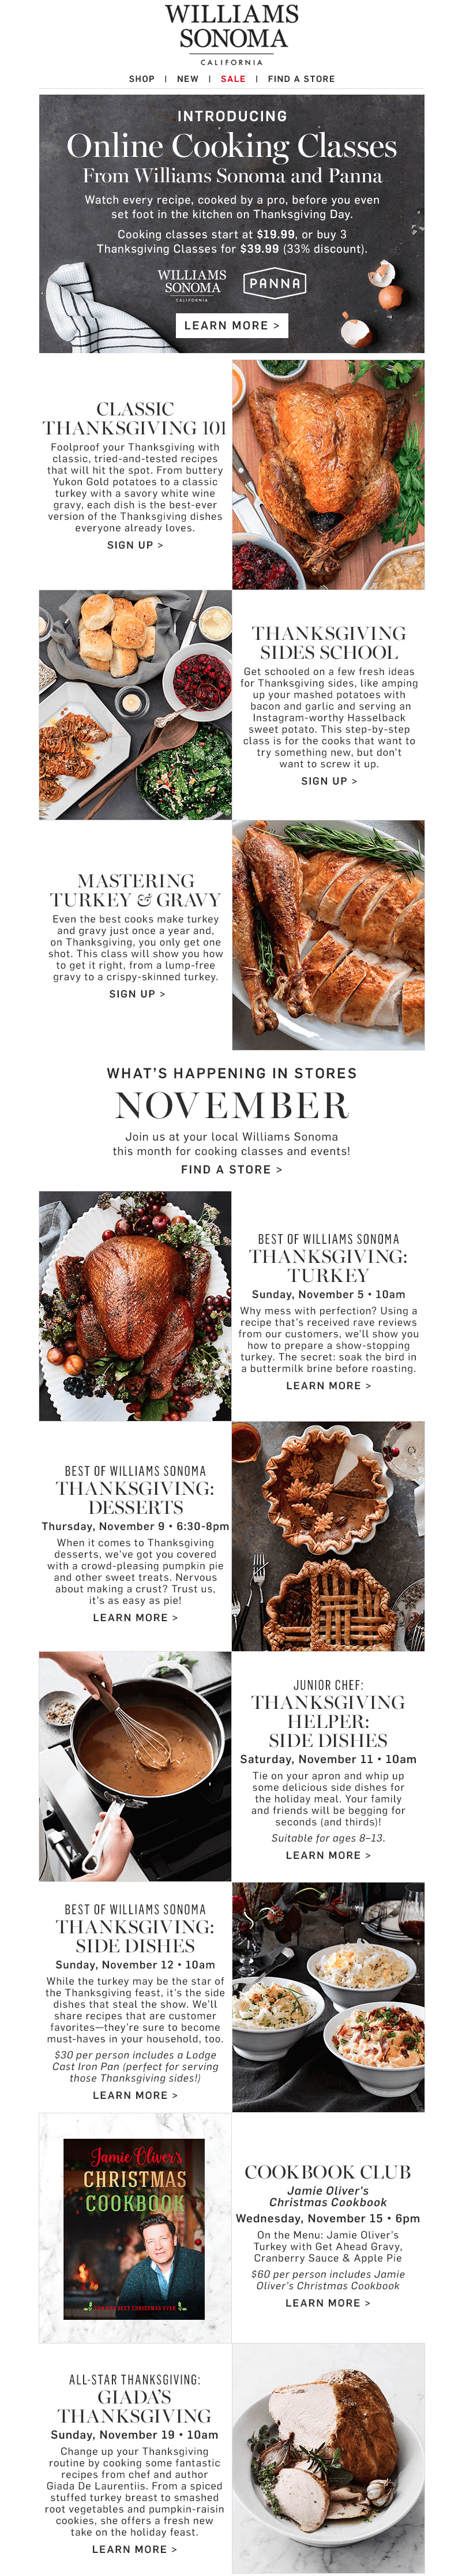 Williams Sonoma Thanksgiving email design